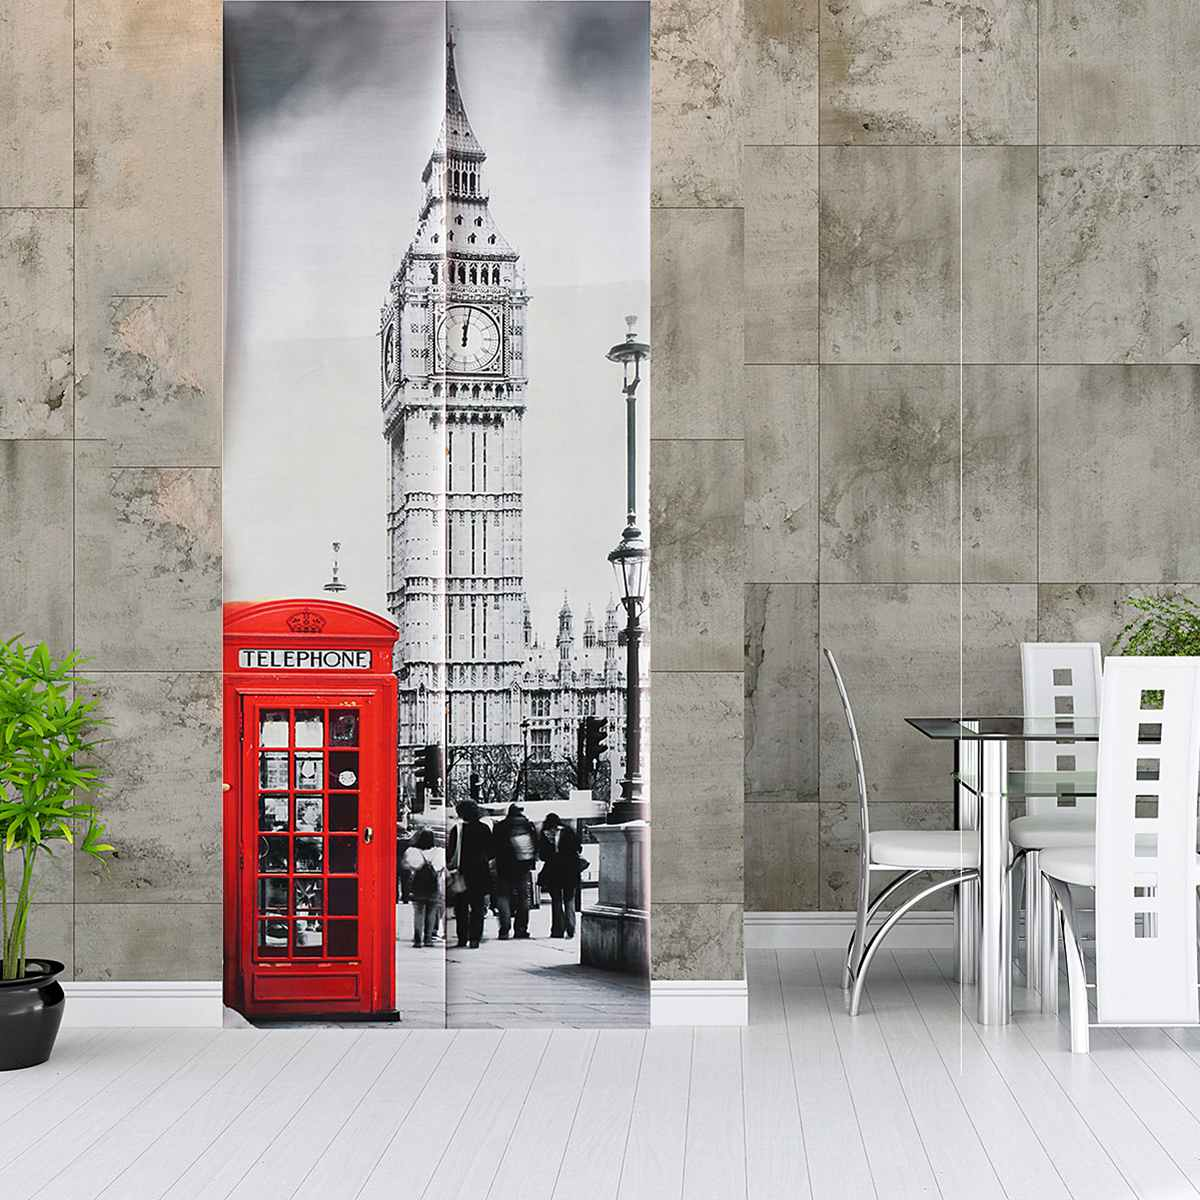 Honest 2pcs/set 3d Sticker Big Ben Telephone Booth 3d Art Door Wall Fridge Sticker Decal Self Adhesive Mural Home Decor 38.5x200cm Door Stickers Home & Garden